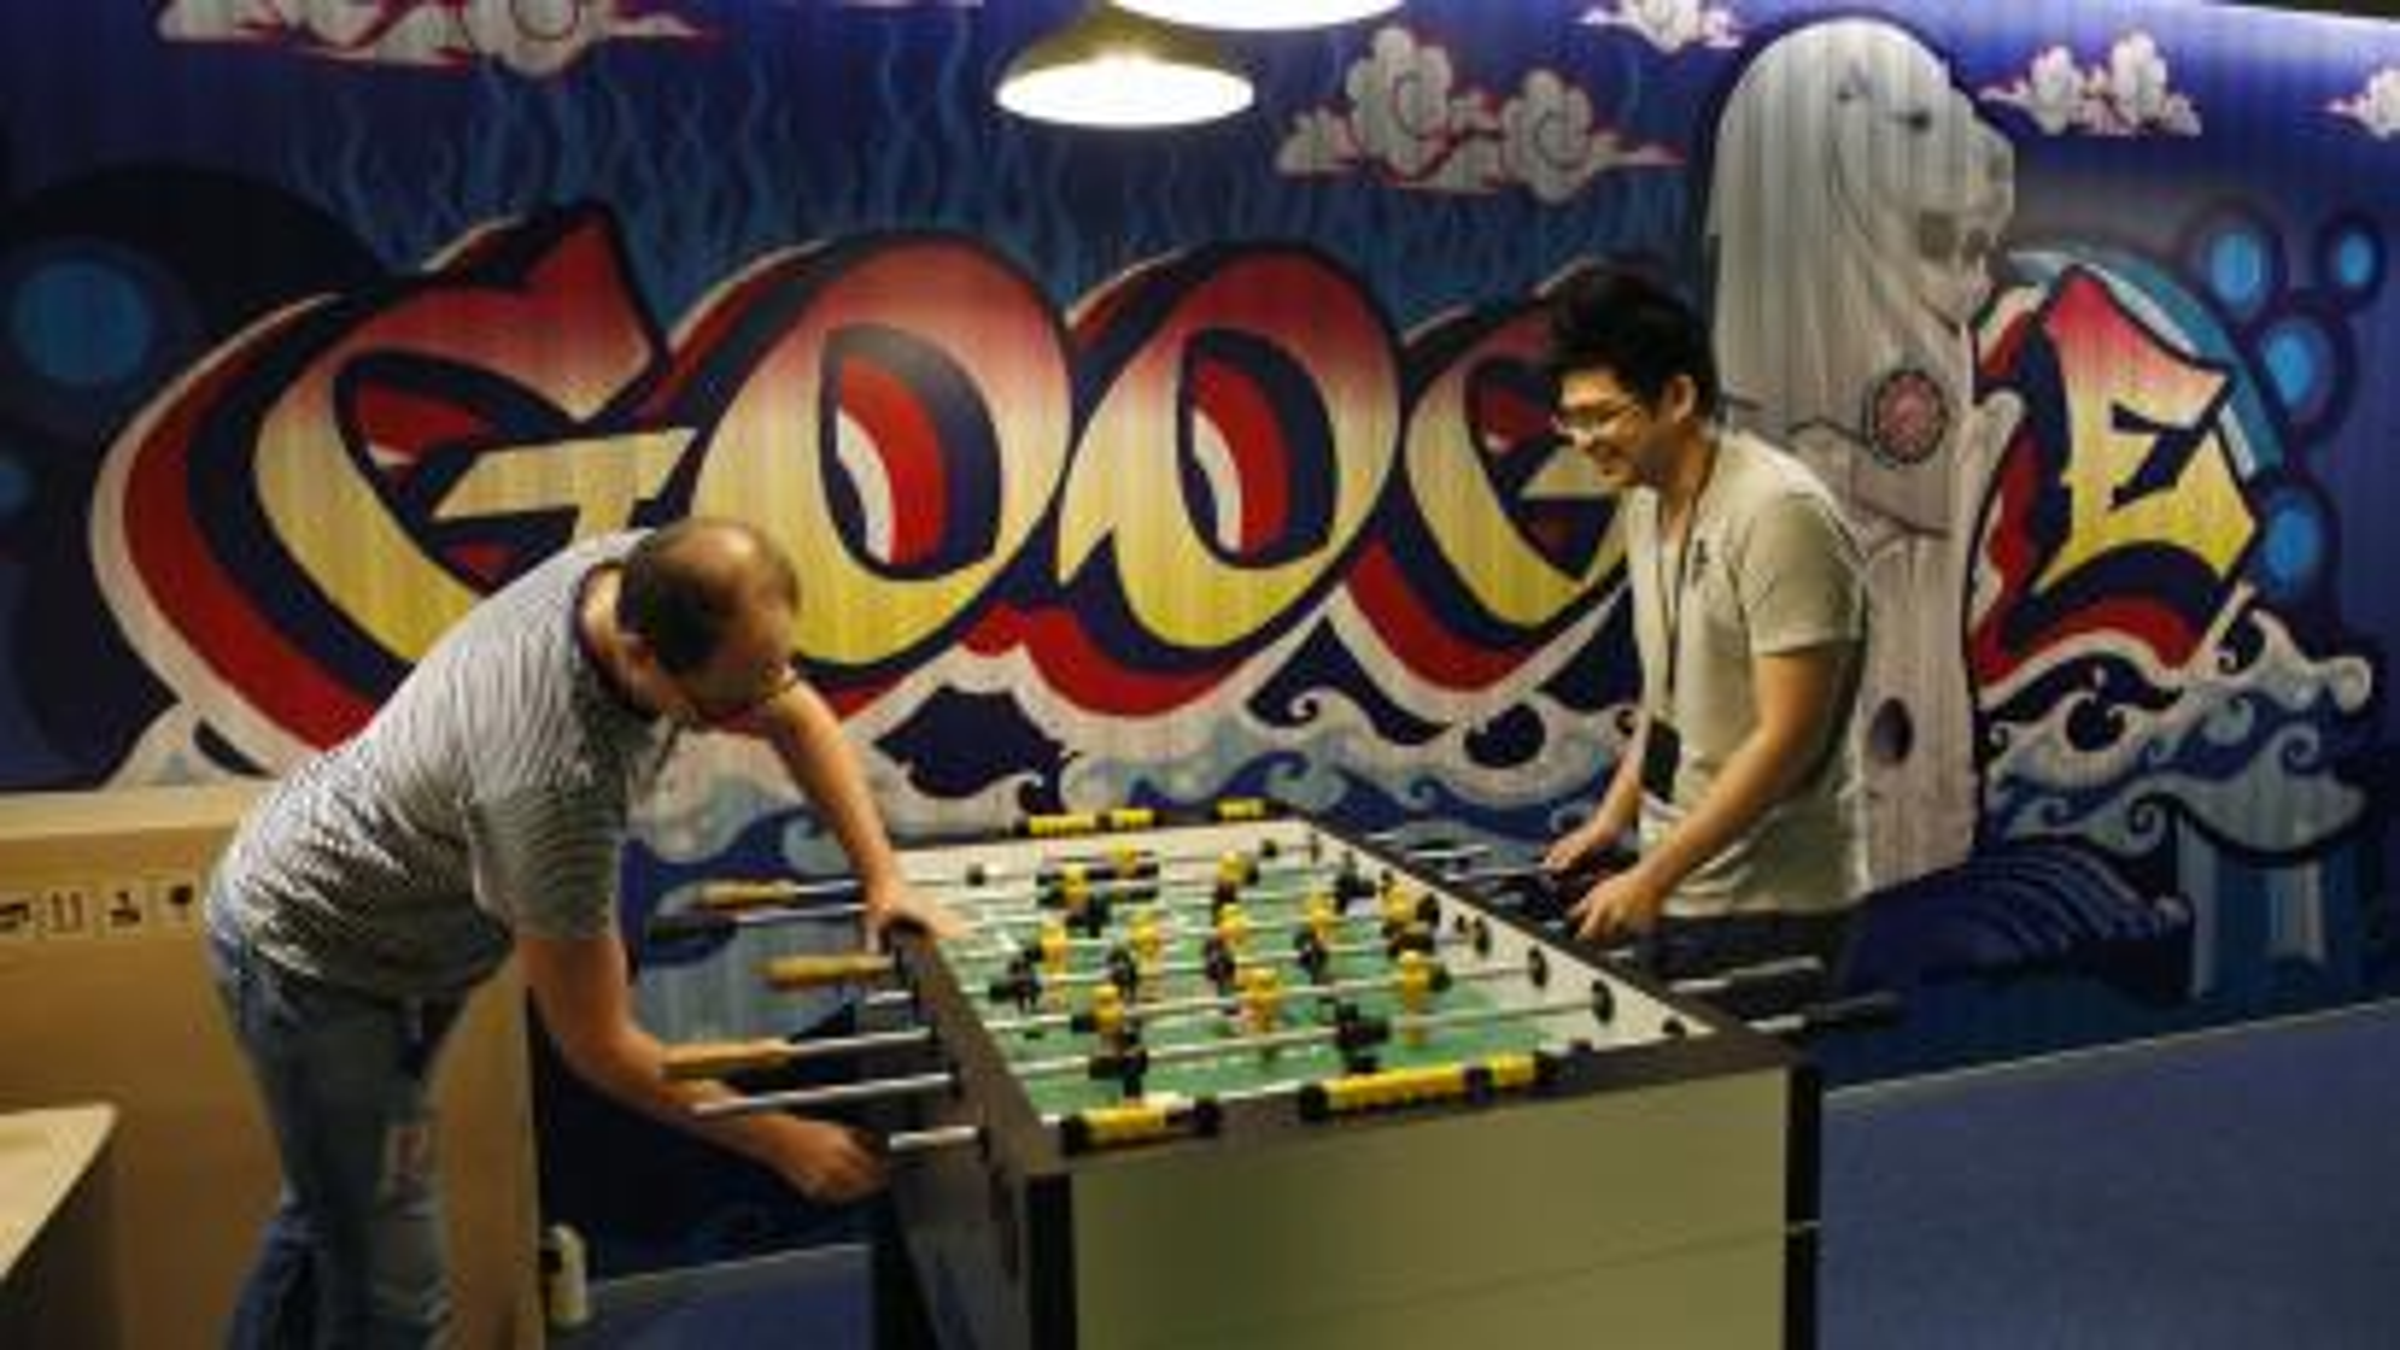 google foozball table